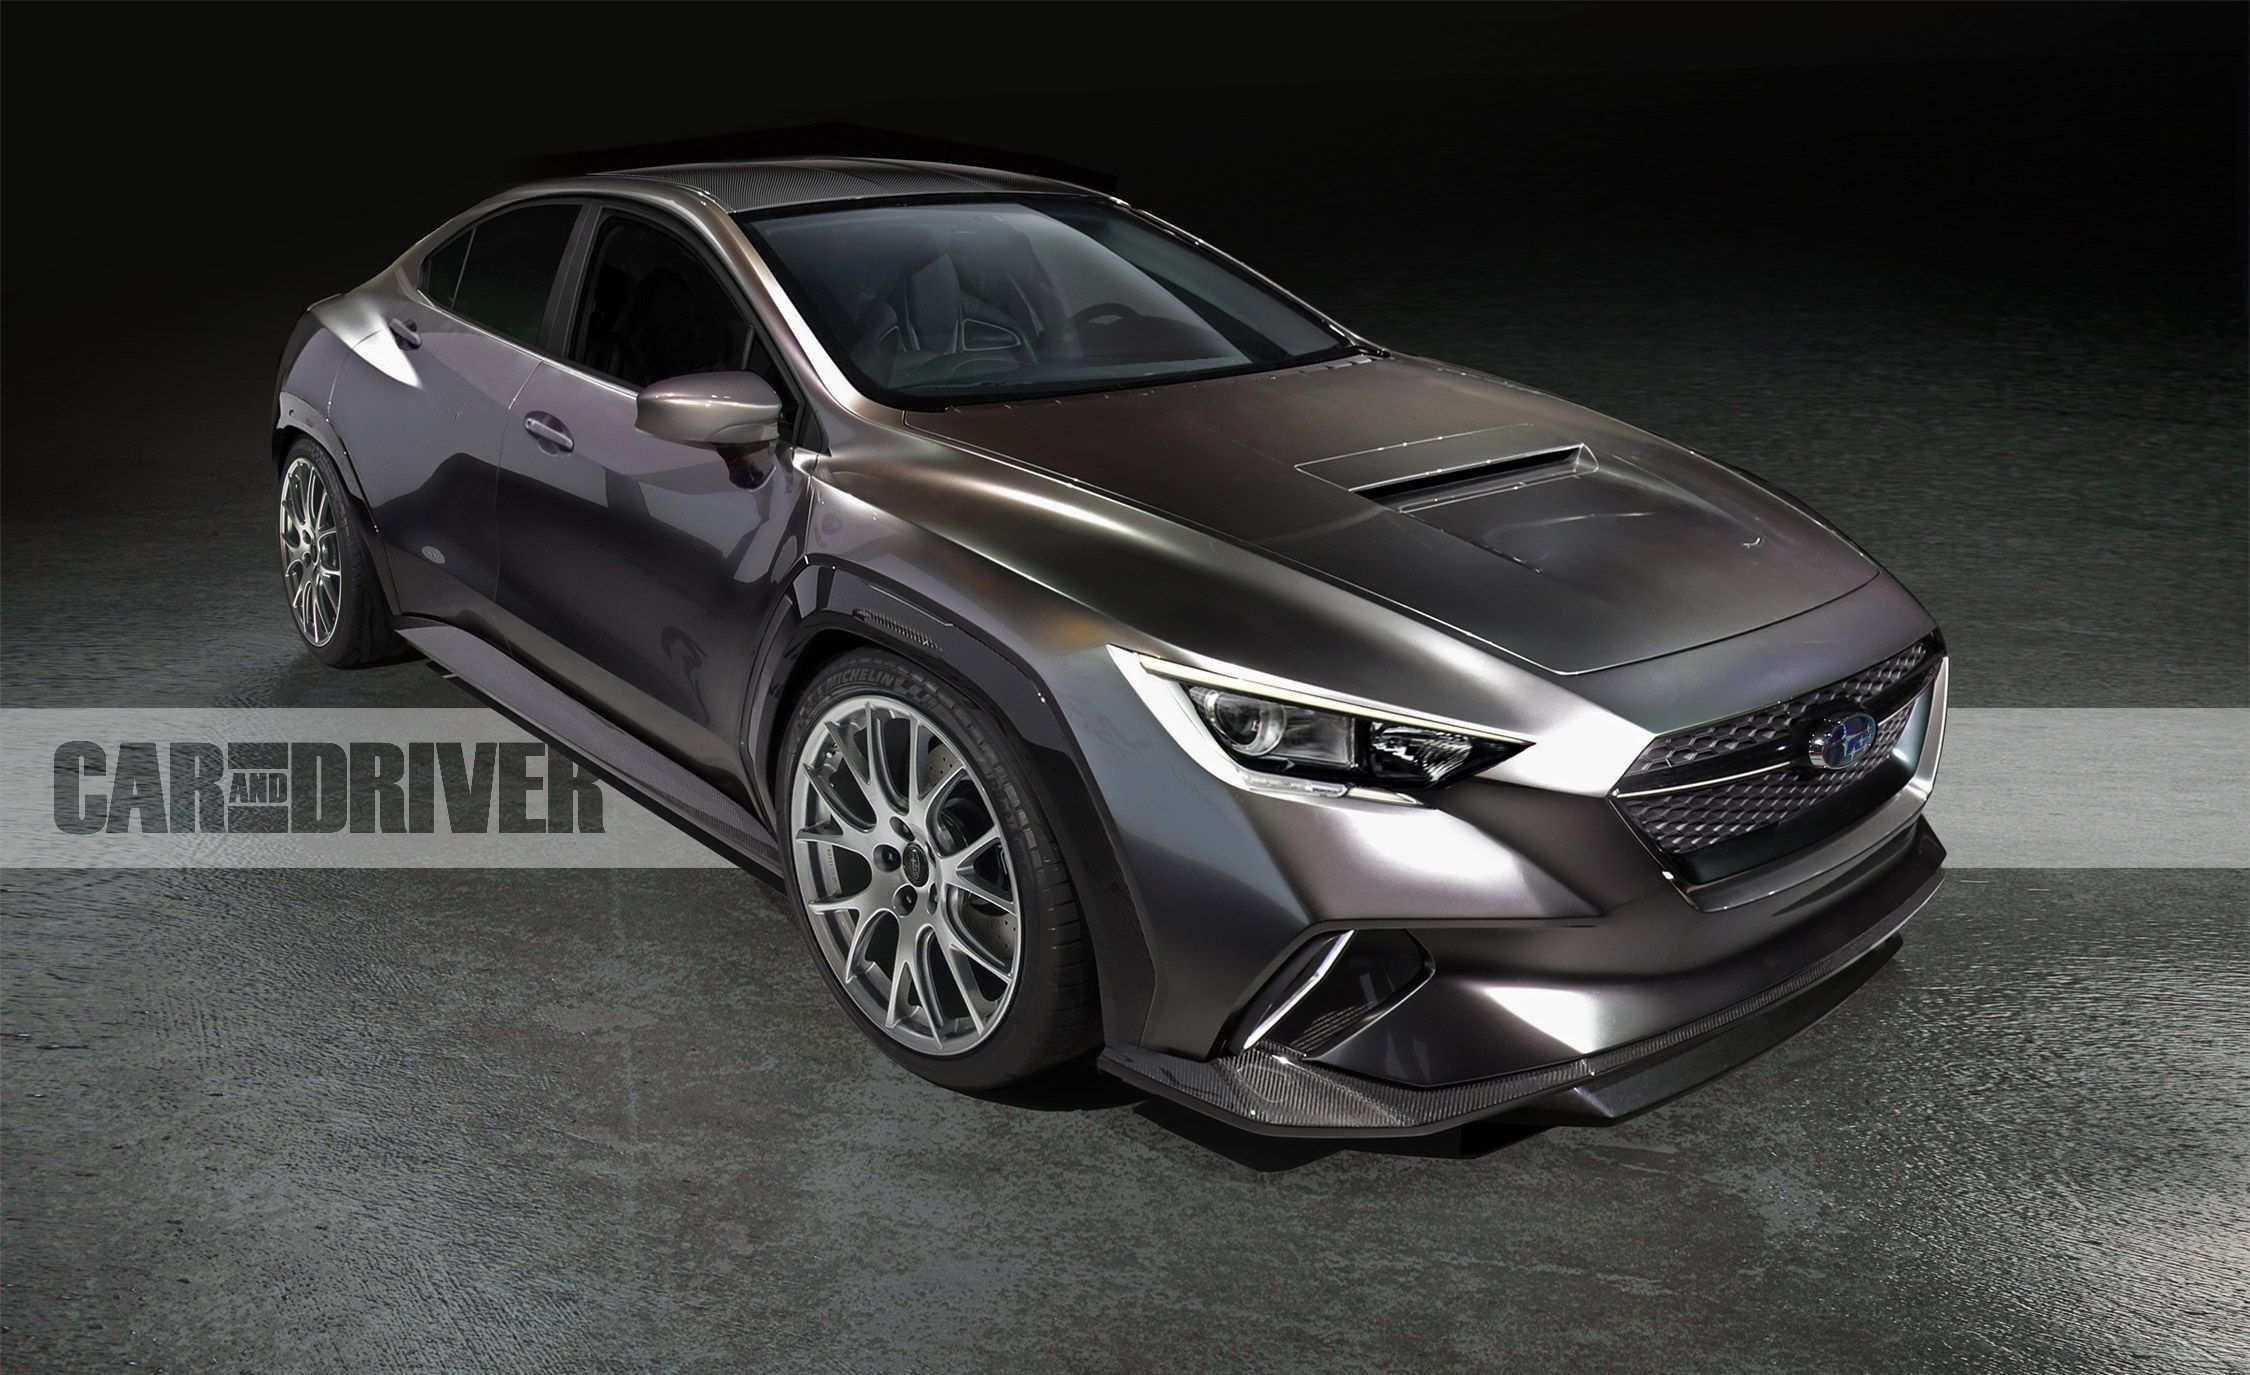 77 New Subaru Wrx Wagon 2020 First Drive by Subaru Wrx Wagon 2020